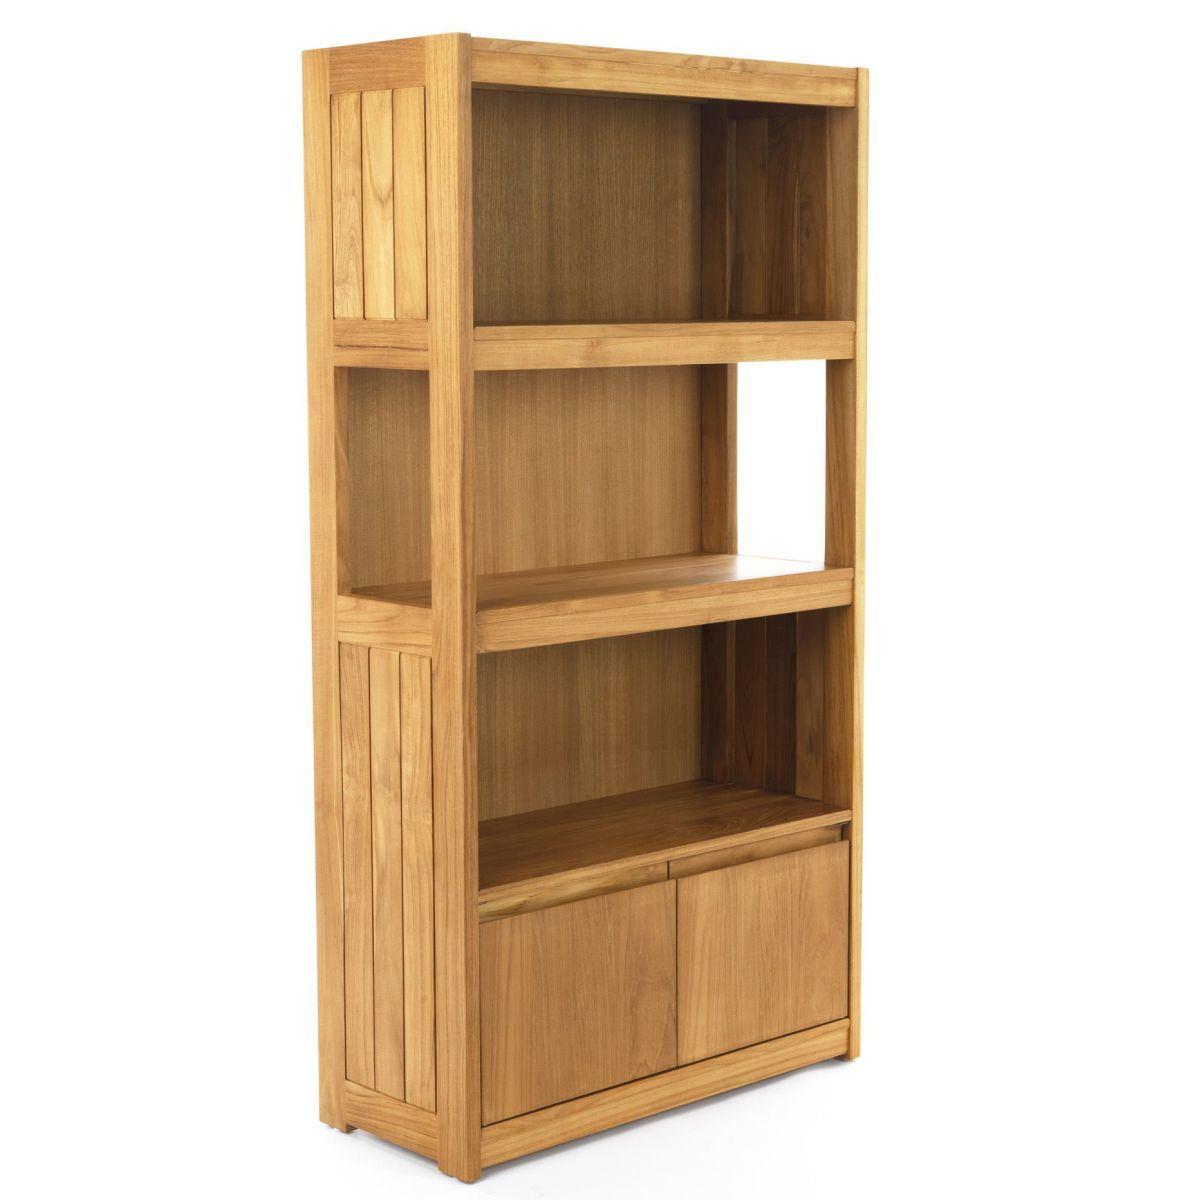 Peque os estantes para libros de madera peque os - Estantes para libros ...